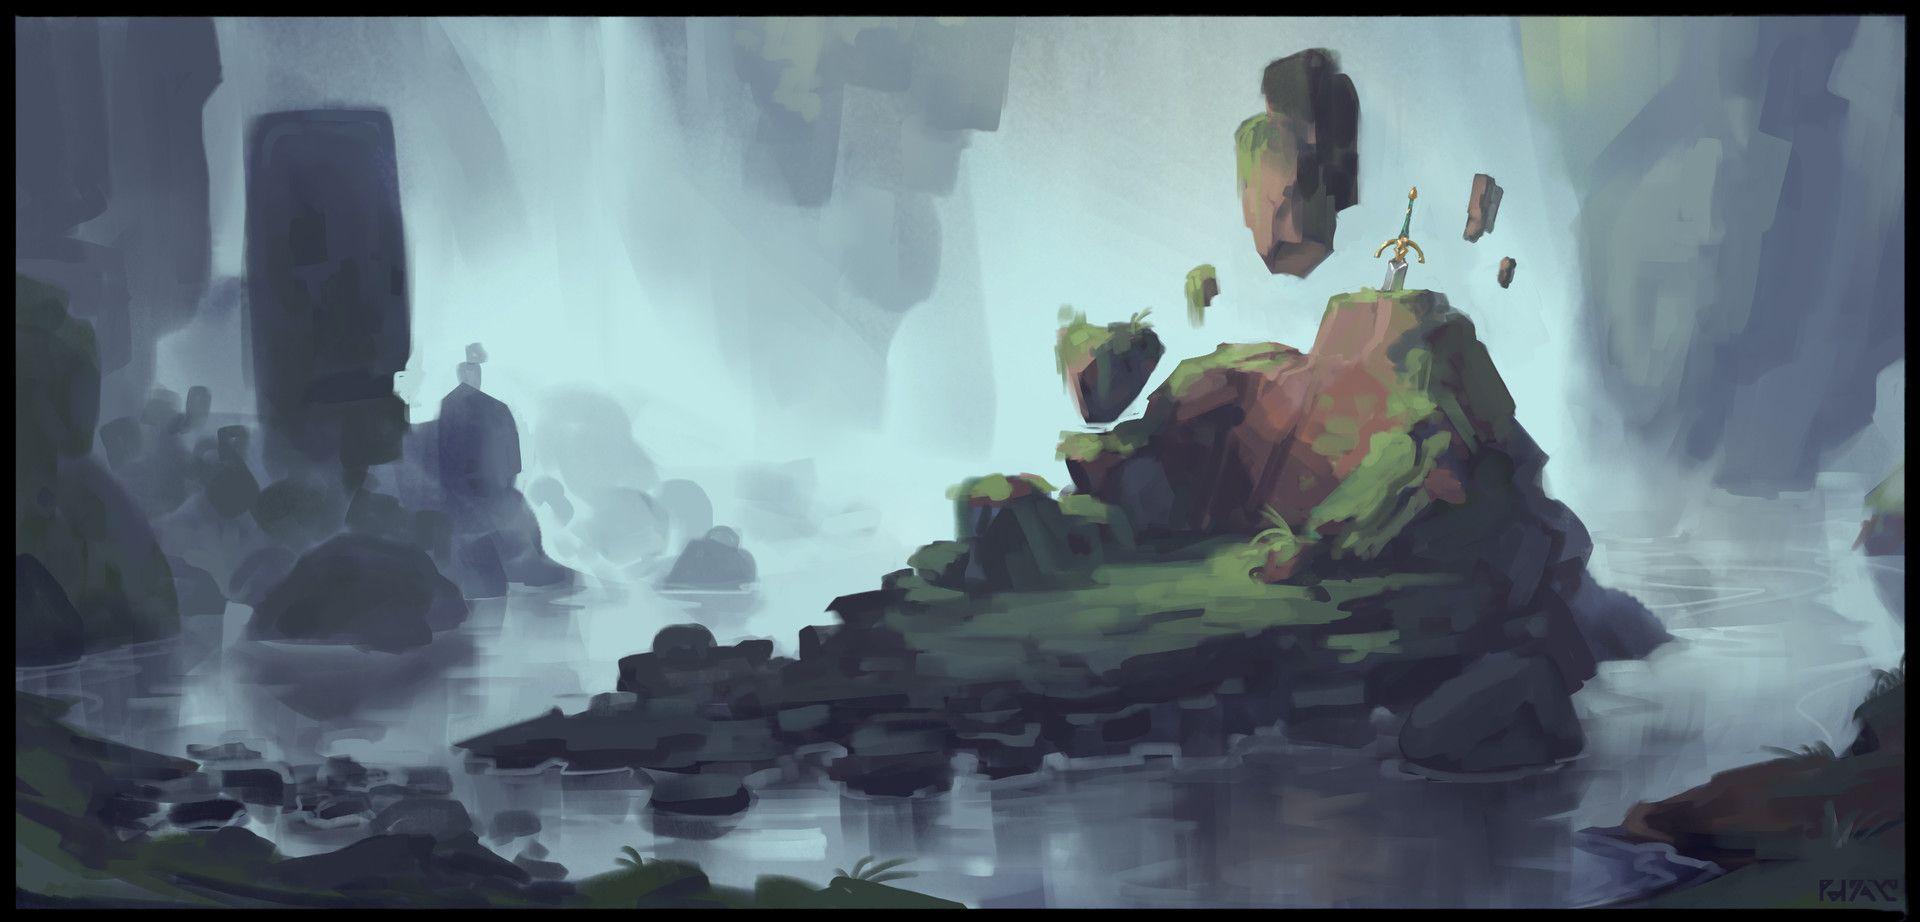 ArtStation - Environment Poops, Max Davenport